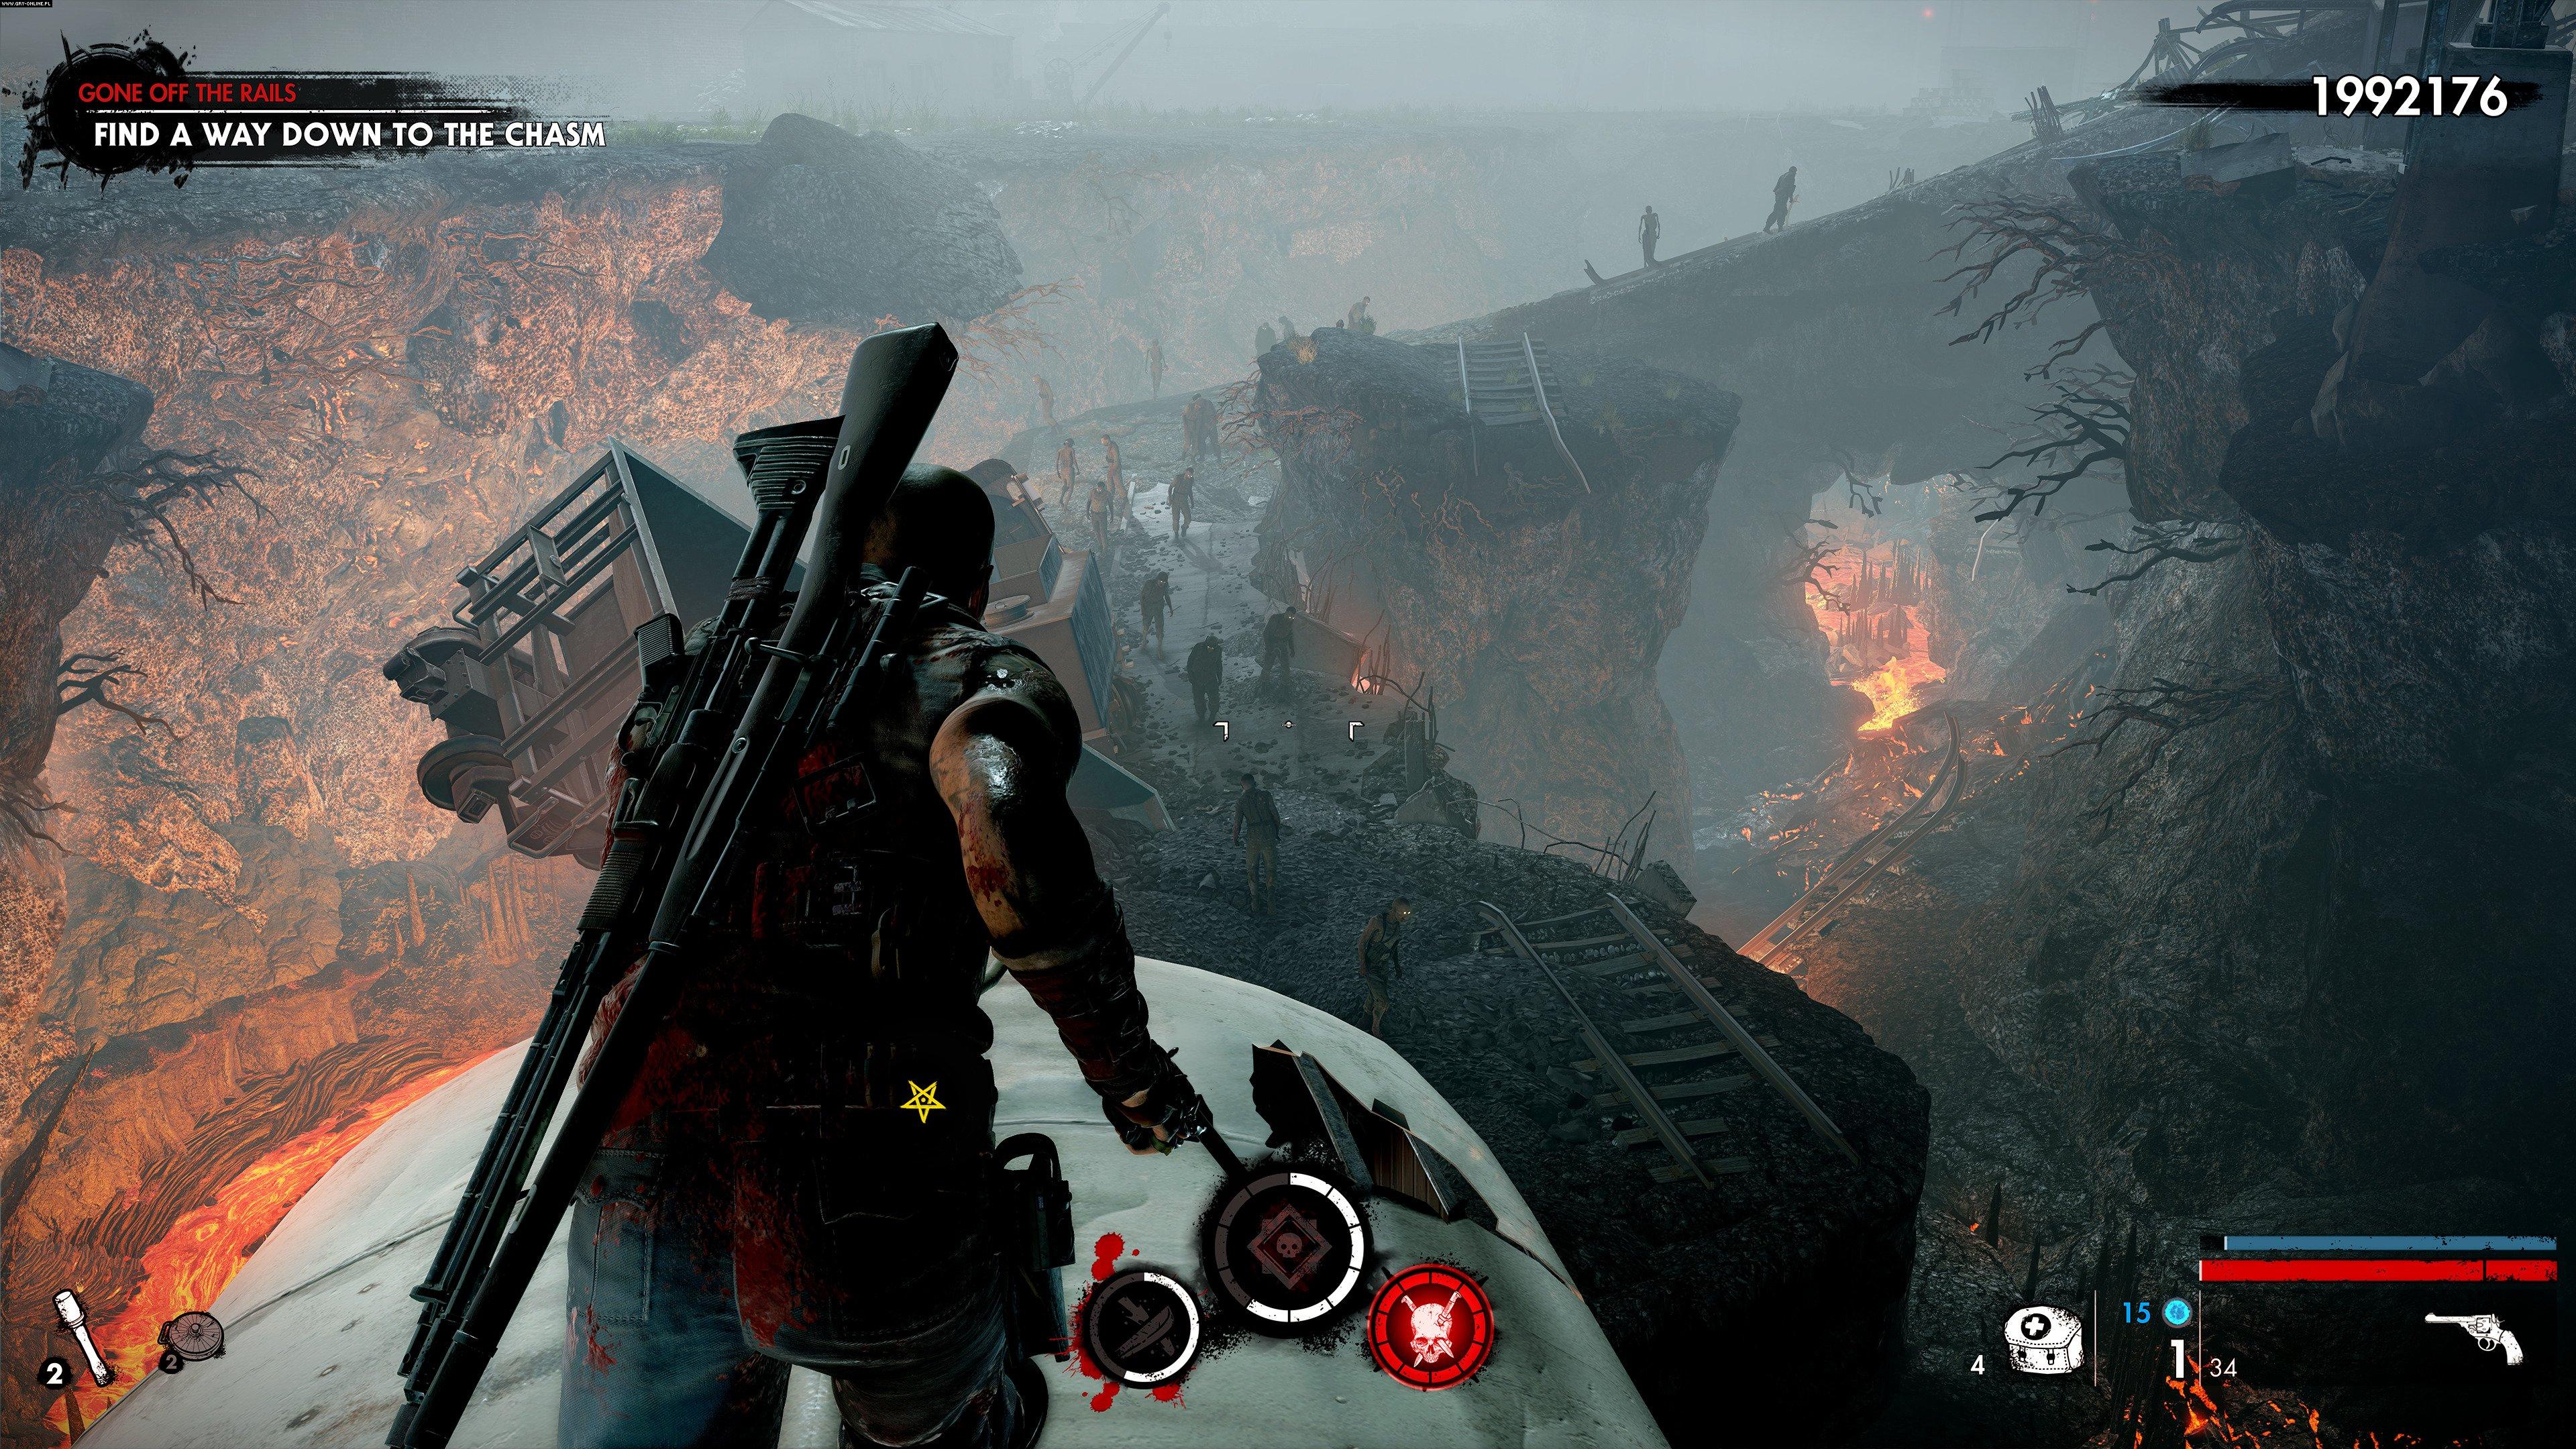 Zombie Army 4: Dead War PC, PS4, XONE Games Image 1/27, Rebellion